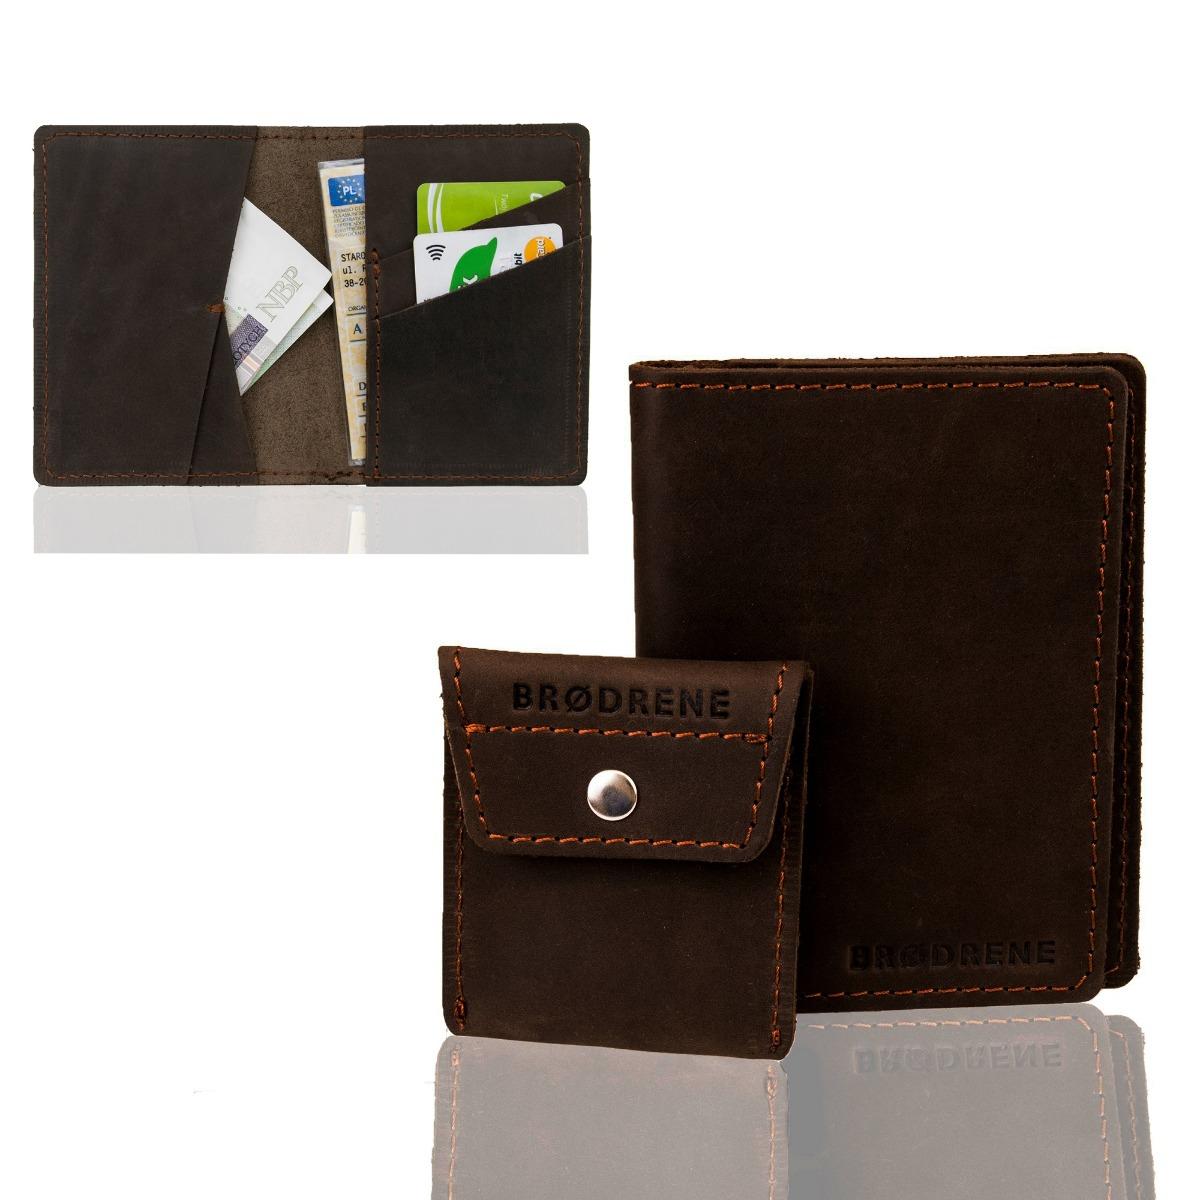 140d5352d9194 akcesoria - portfele-Komplet portfel i bilonówka brodrene sw07 slim